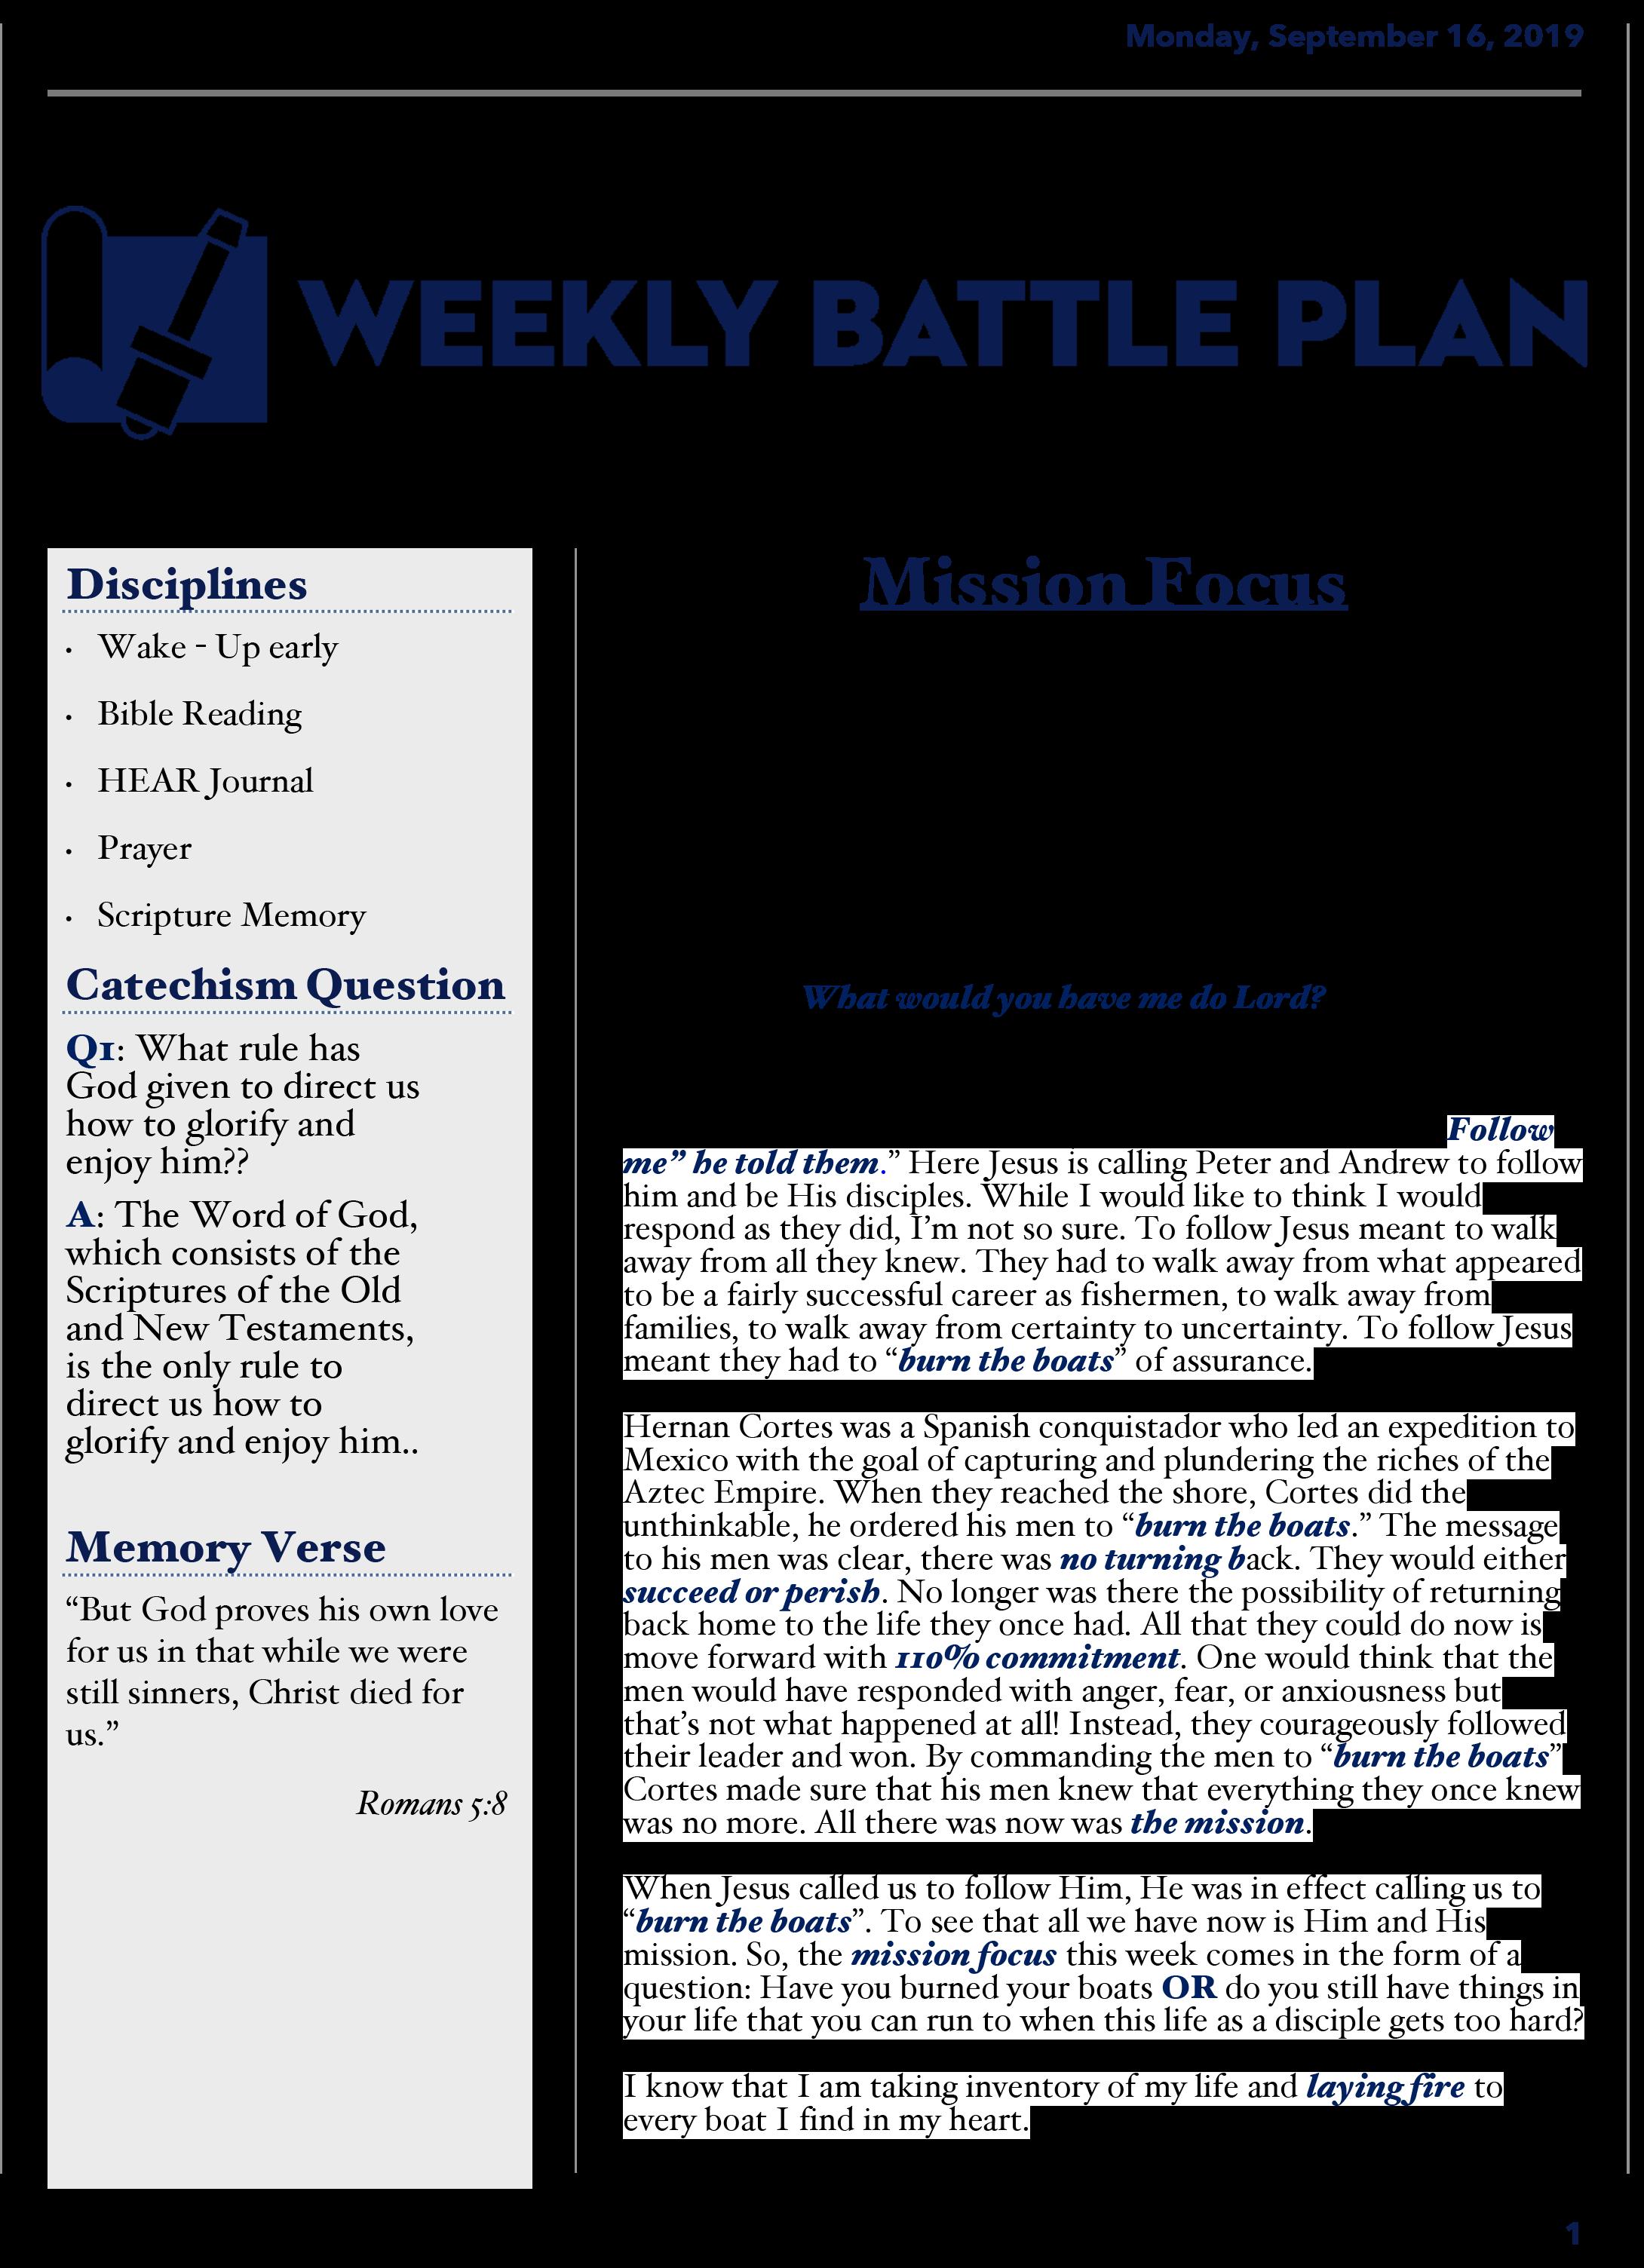 Battle Plan (9.16.19)-1.png